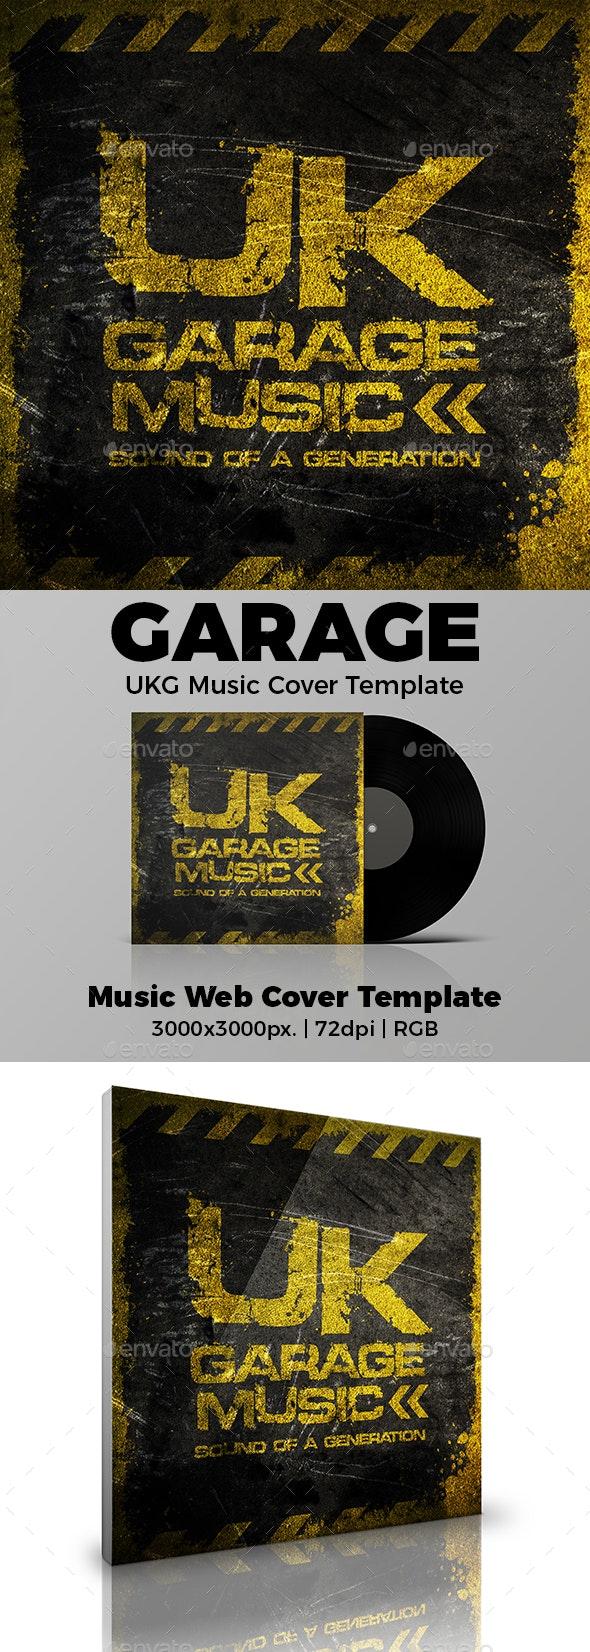 UK Garage UKG Music Cover Template - Miscellaneous Social Media